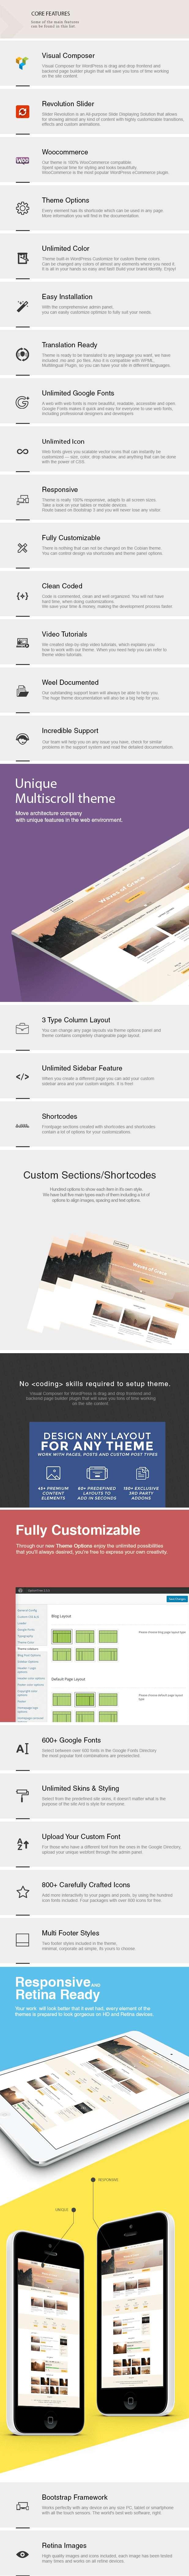 Our Church - Responsive Multipurpose WordPress Churches Theme - 3